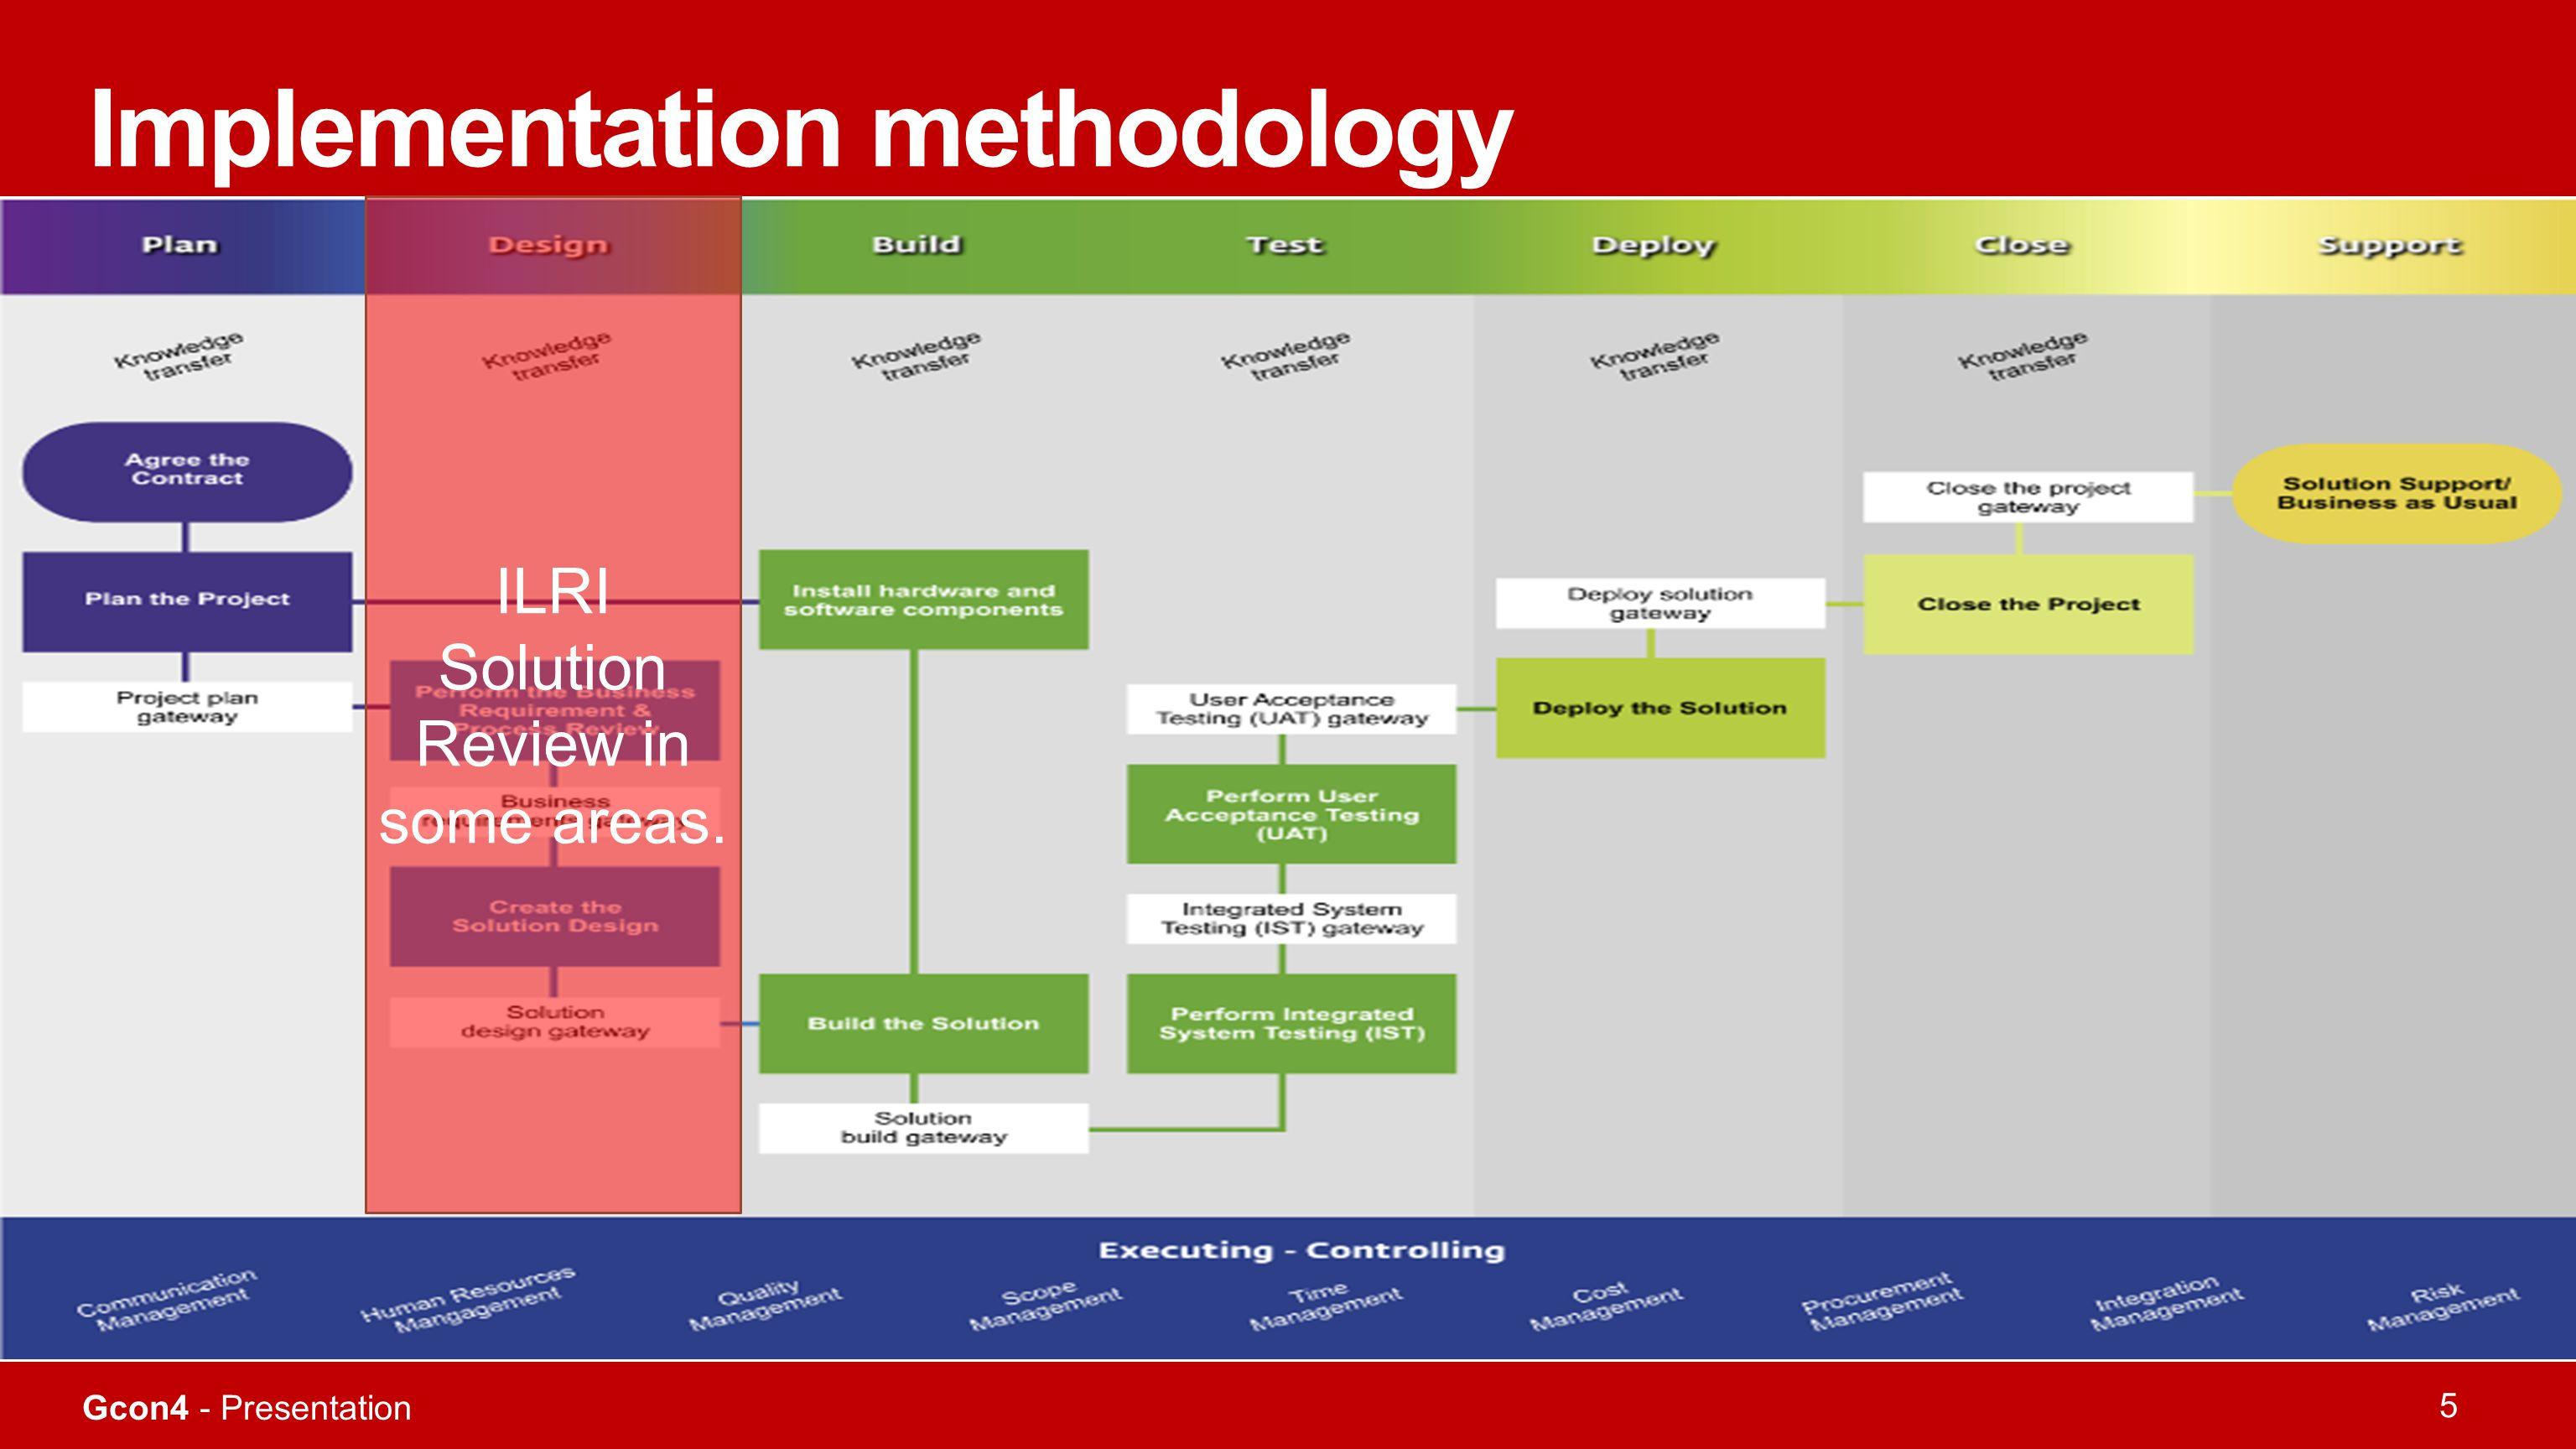 Gcon4 - Presentation 5 Implementation methodology ILRI Solution Review in some areas.